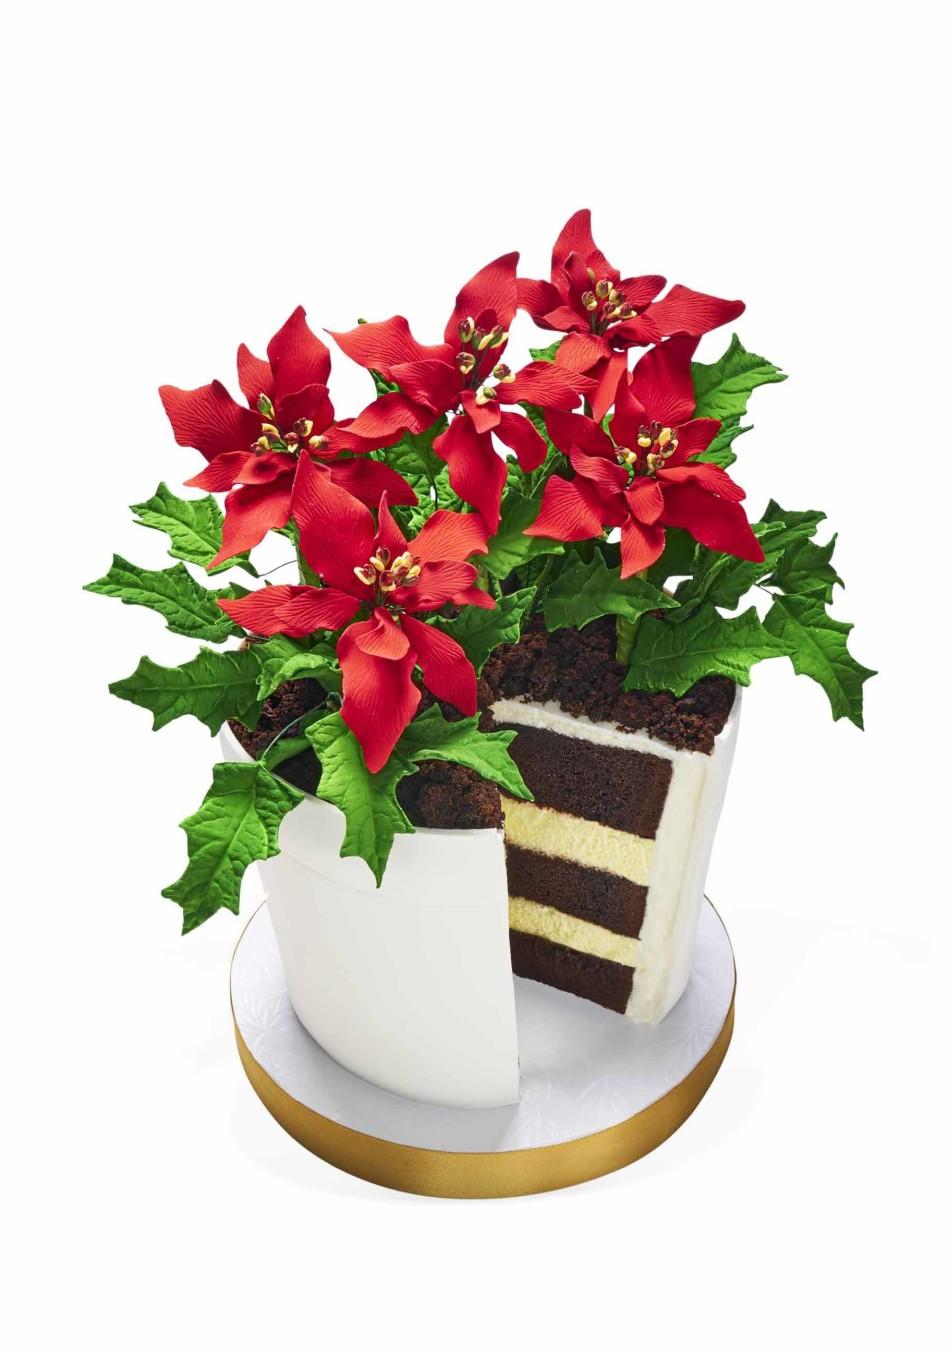 201612-omag-oprah-favorite-things-pointsetta-cake-949x1356.jpg